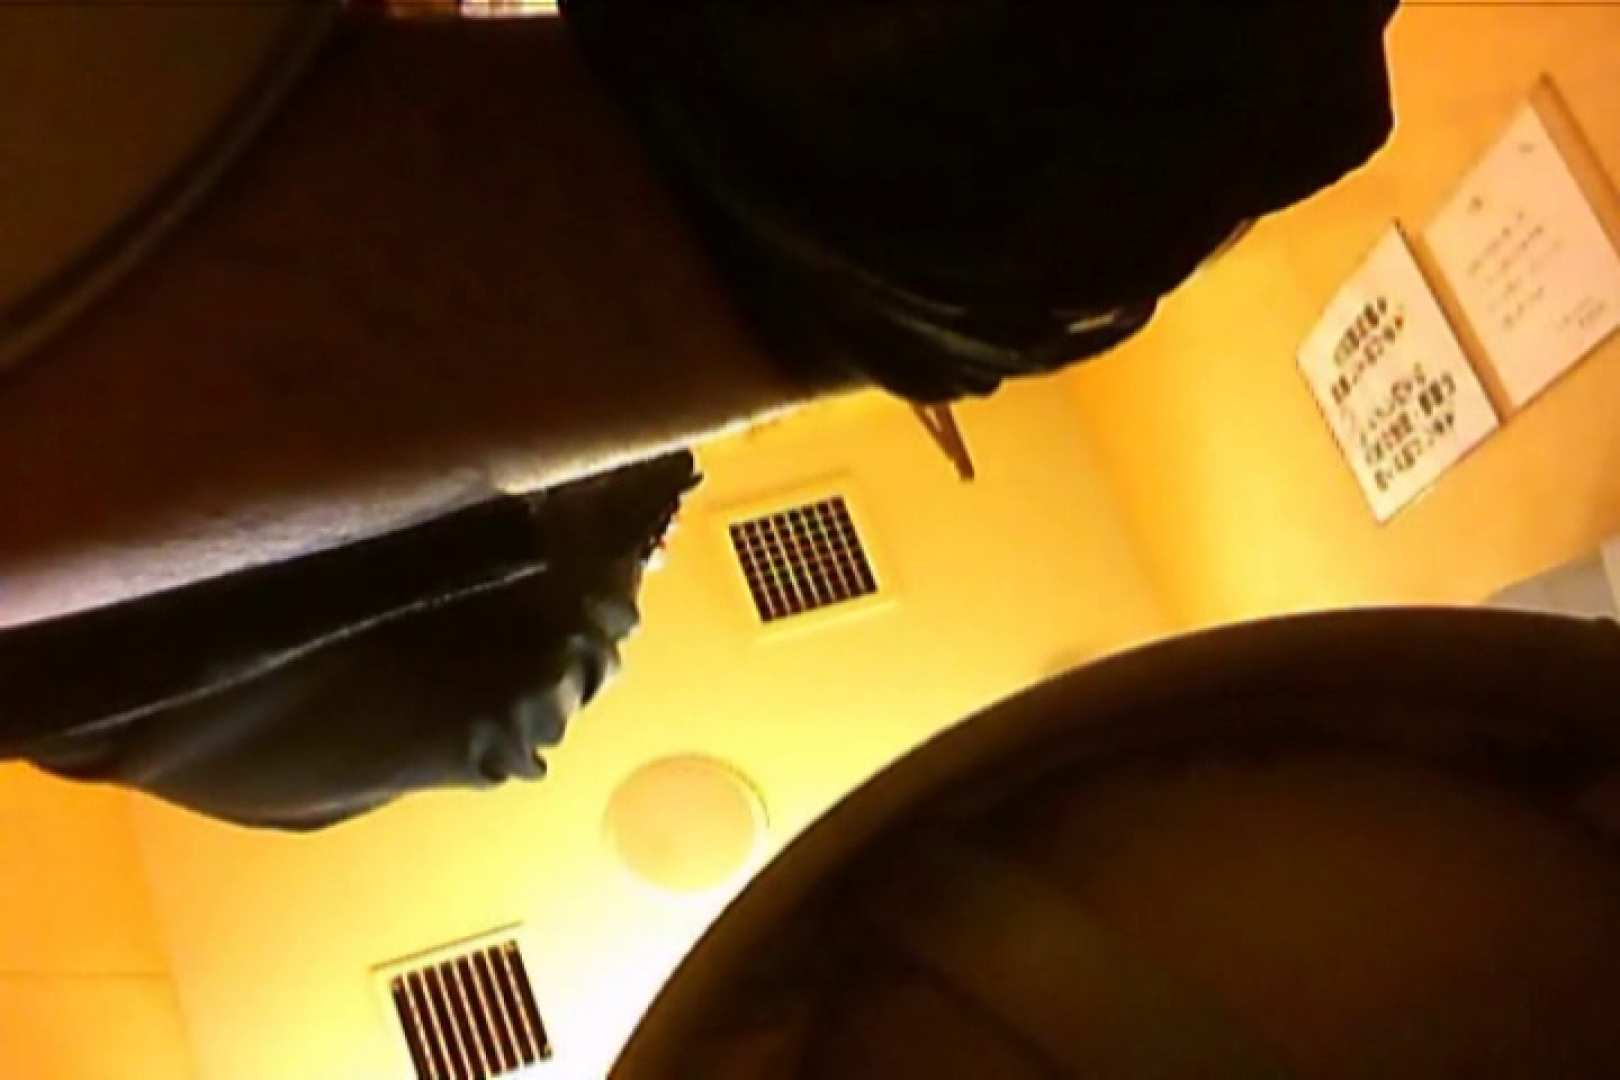 SEASON 2ND!掴み取りさんの洗面所覗き!in新幹線!VOL.04 覗きシーン おちんちん画像 63枚 7